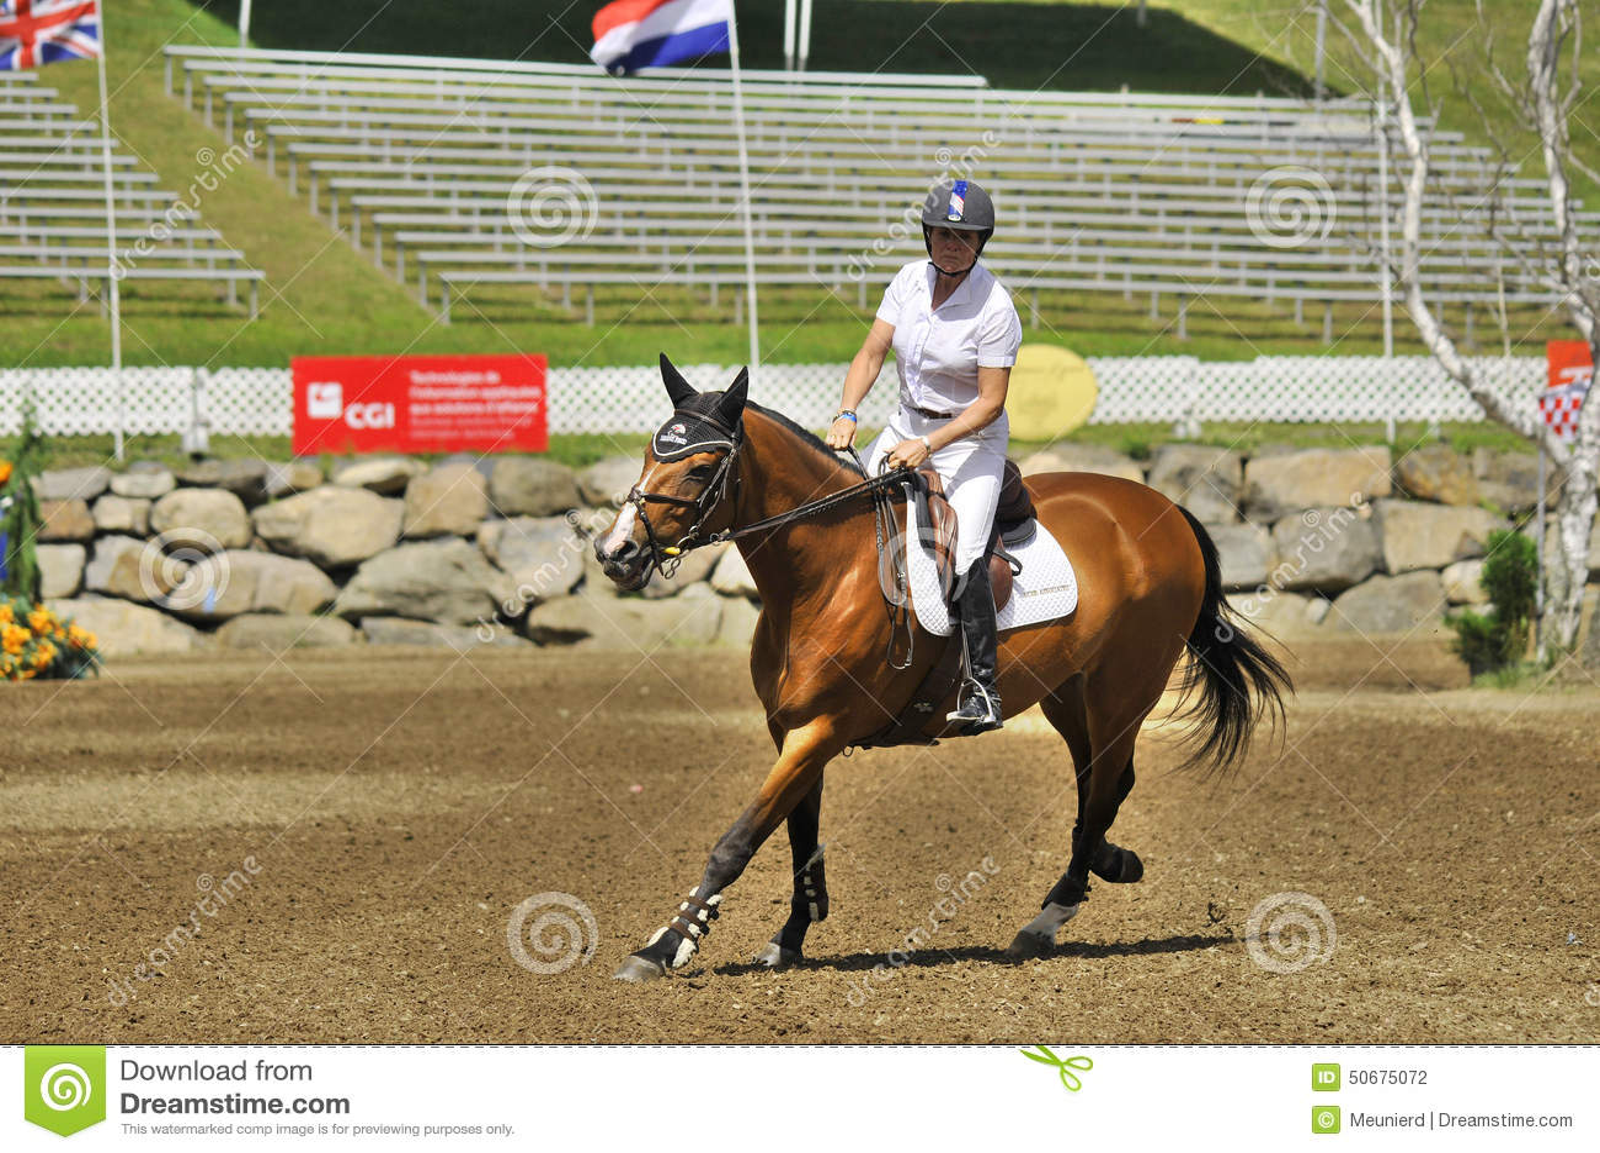 Download 国际BROMONT 图库摄影片. 图片 包括有 御马者, 云彩, 范围, 蒙特利尔, 骑马, 农场, 概念 - 50675072